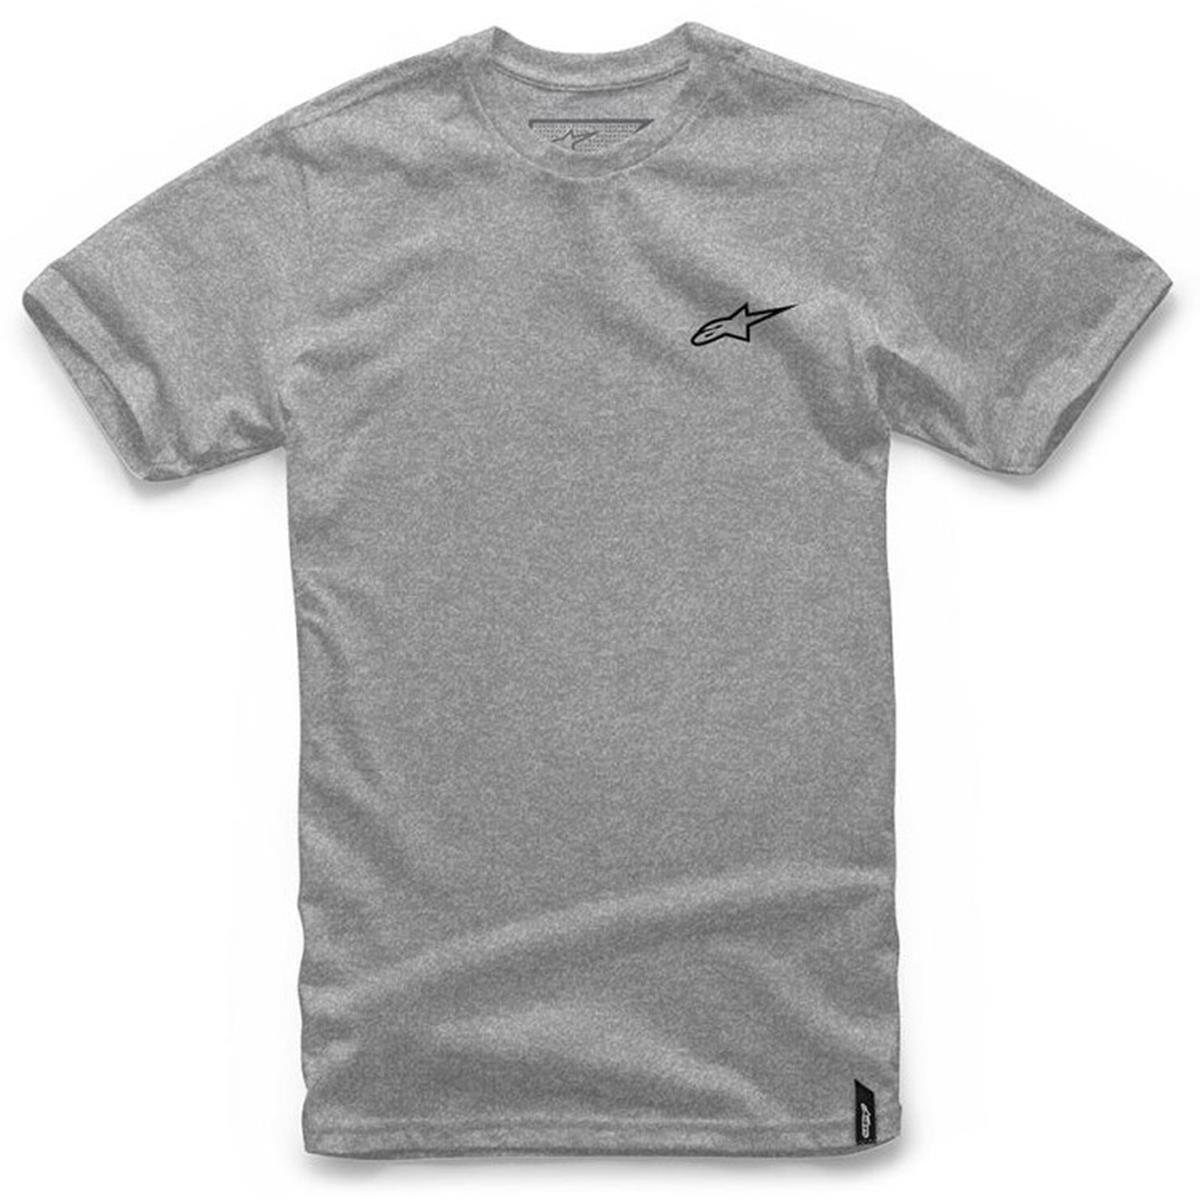 Alpinestars T-Shirt Neu Ageless Grey Heather/Schwarz